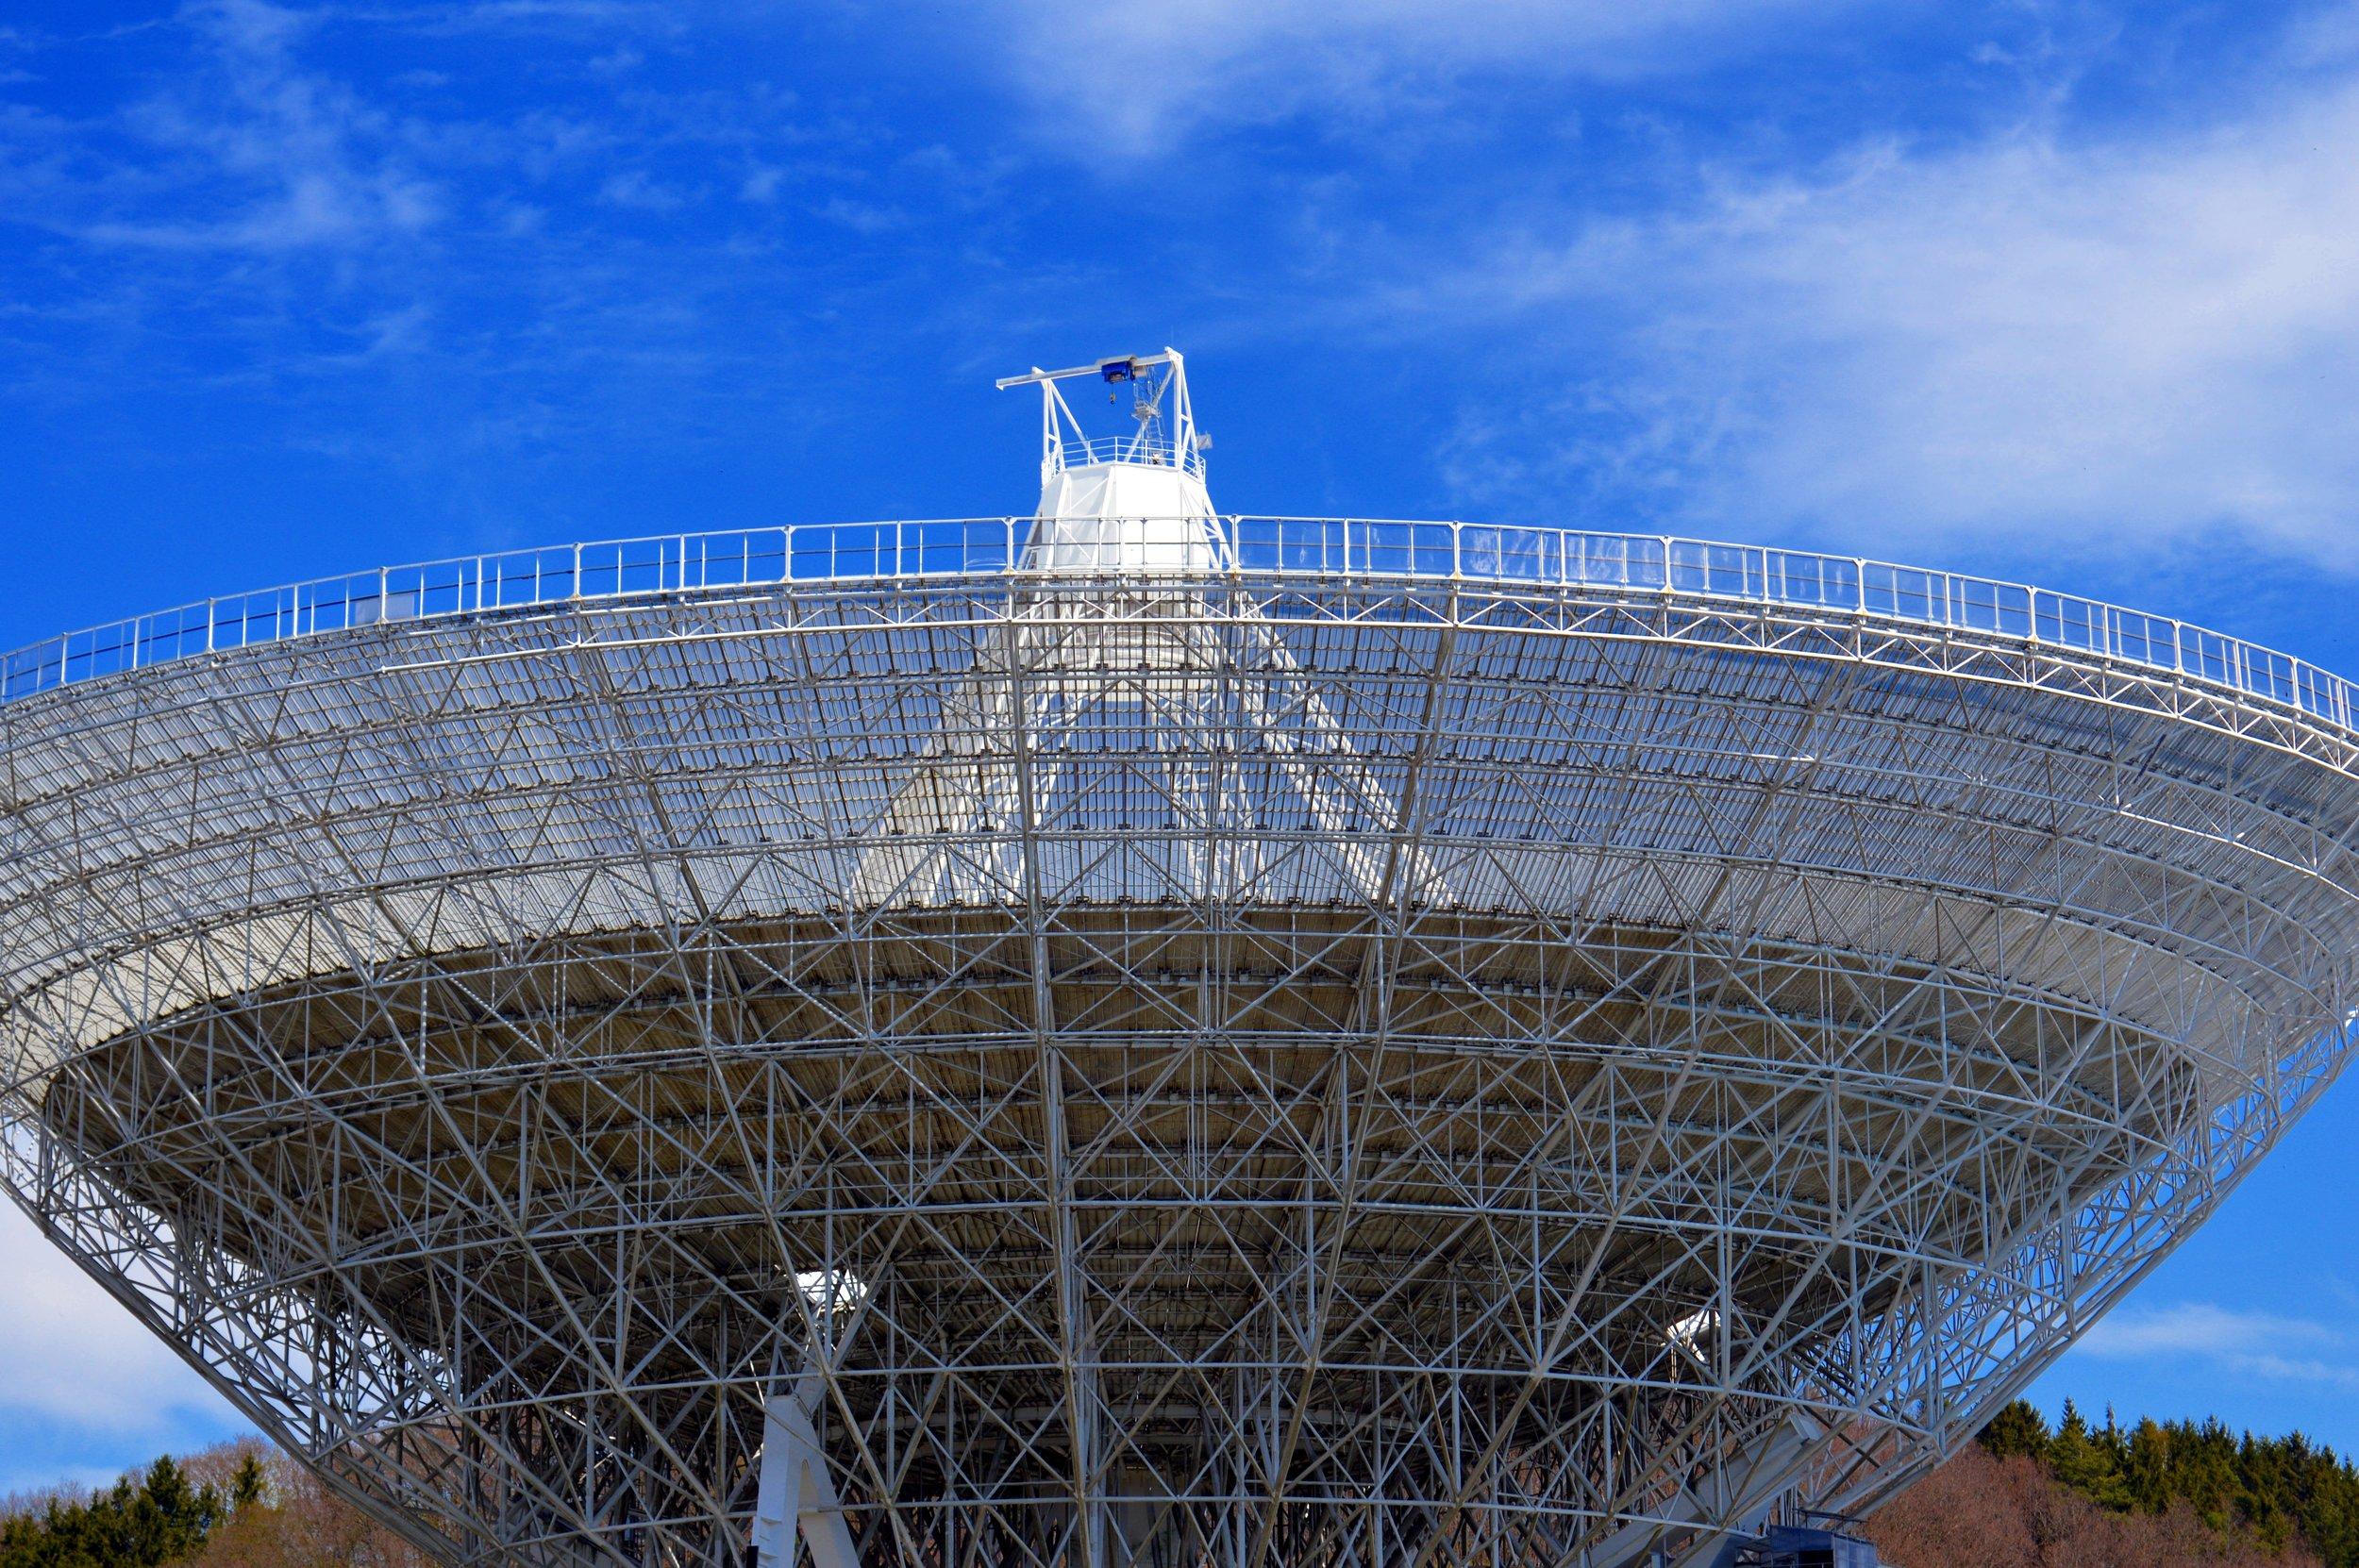 air-broadcast-antenna-architecture-414812.jpg